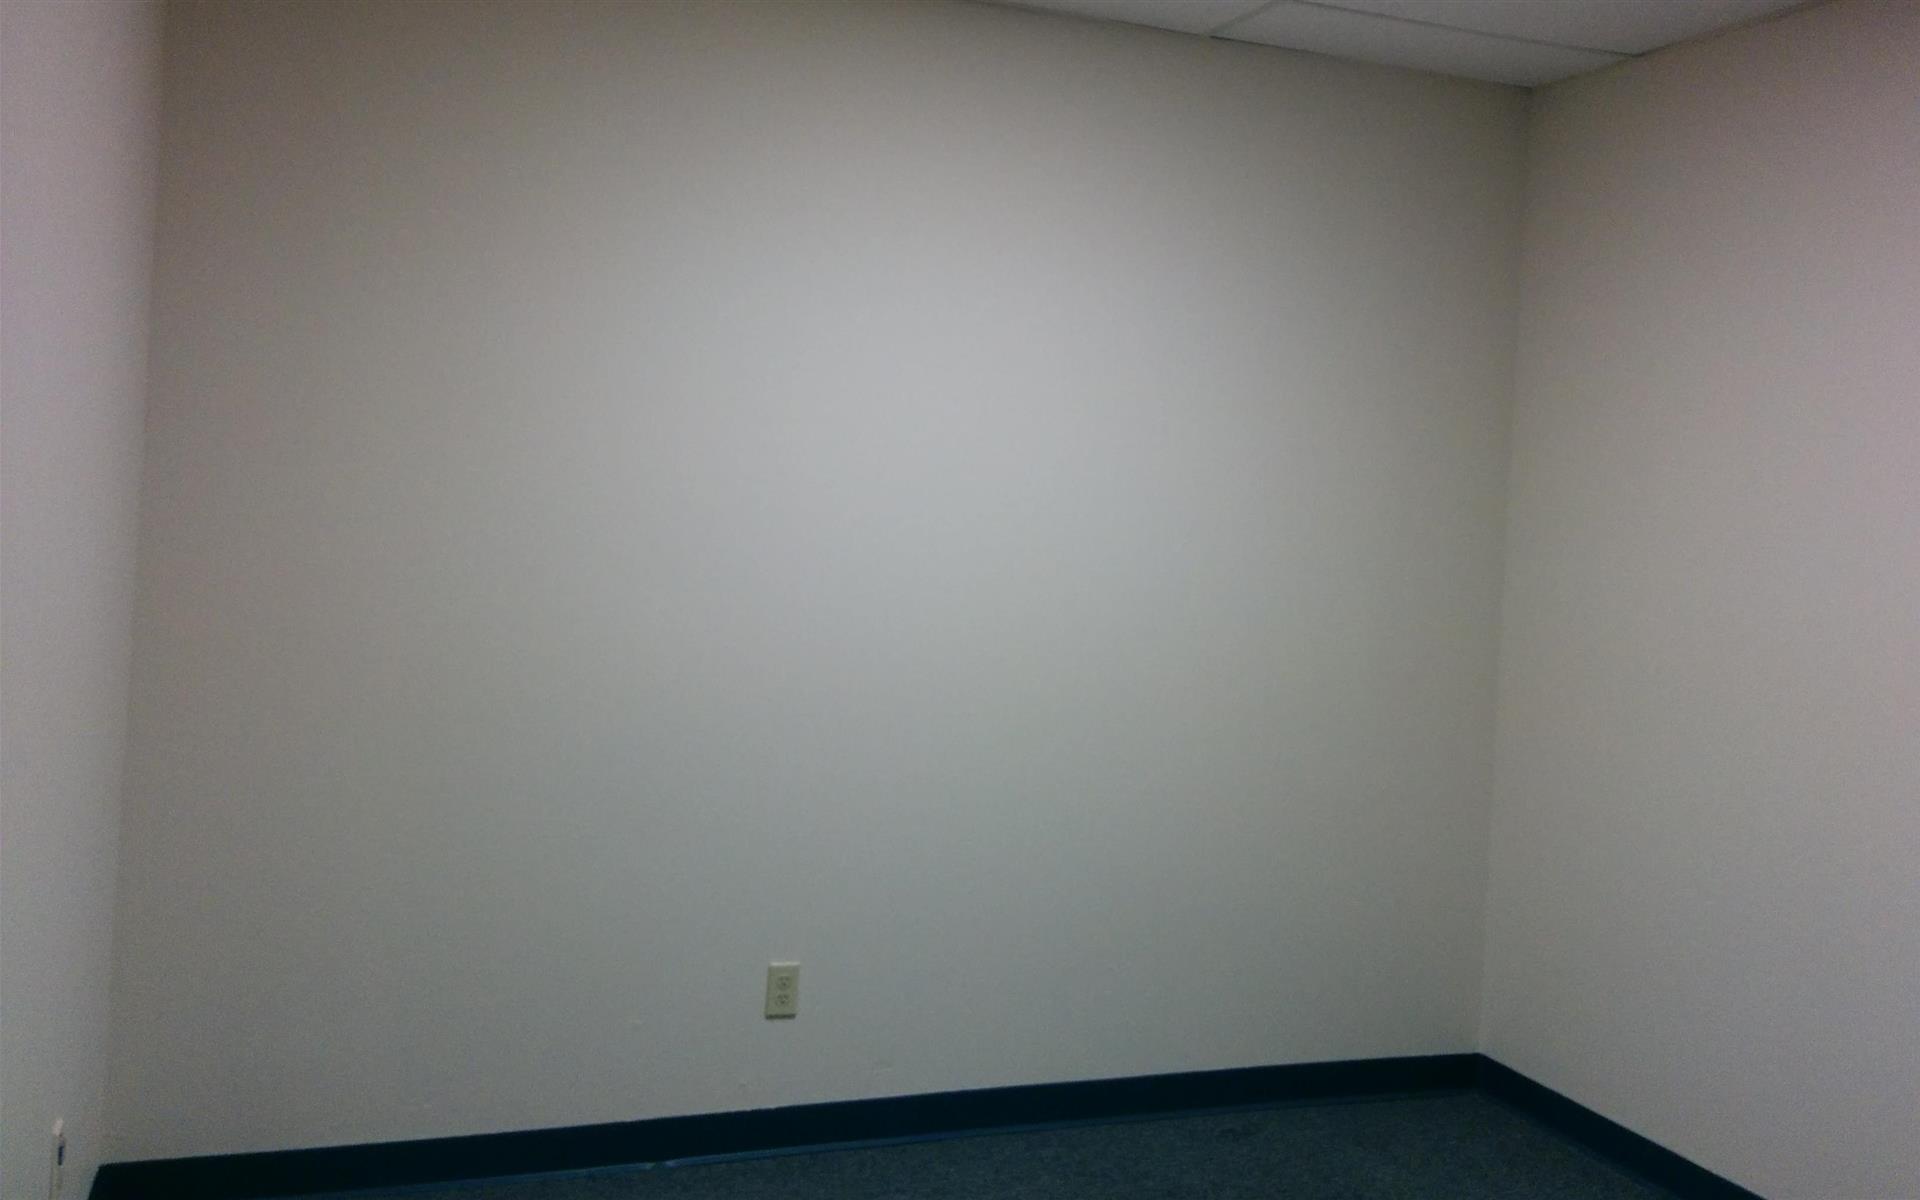 McKinney Office Suites - Room 116